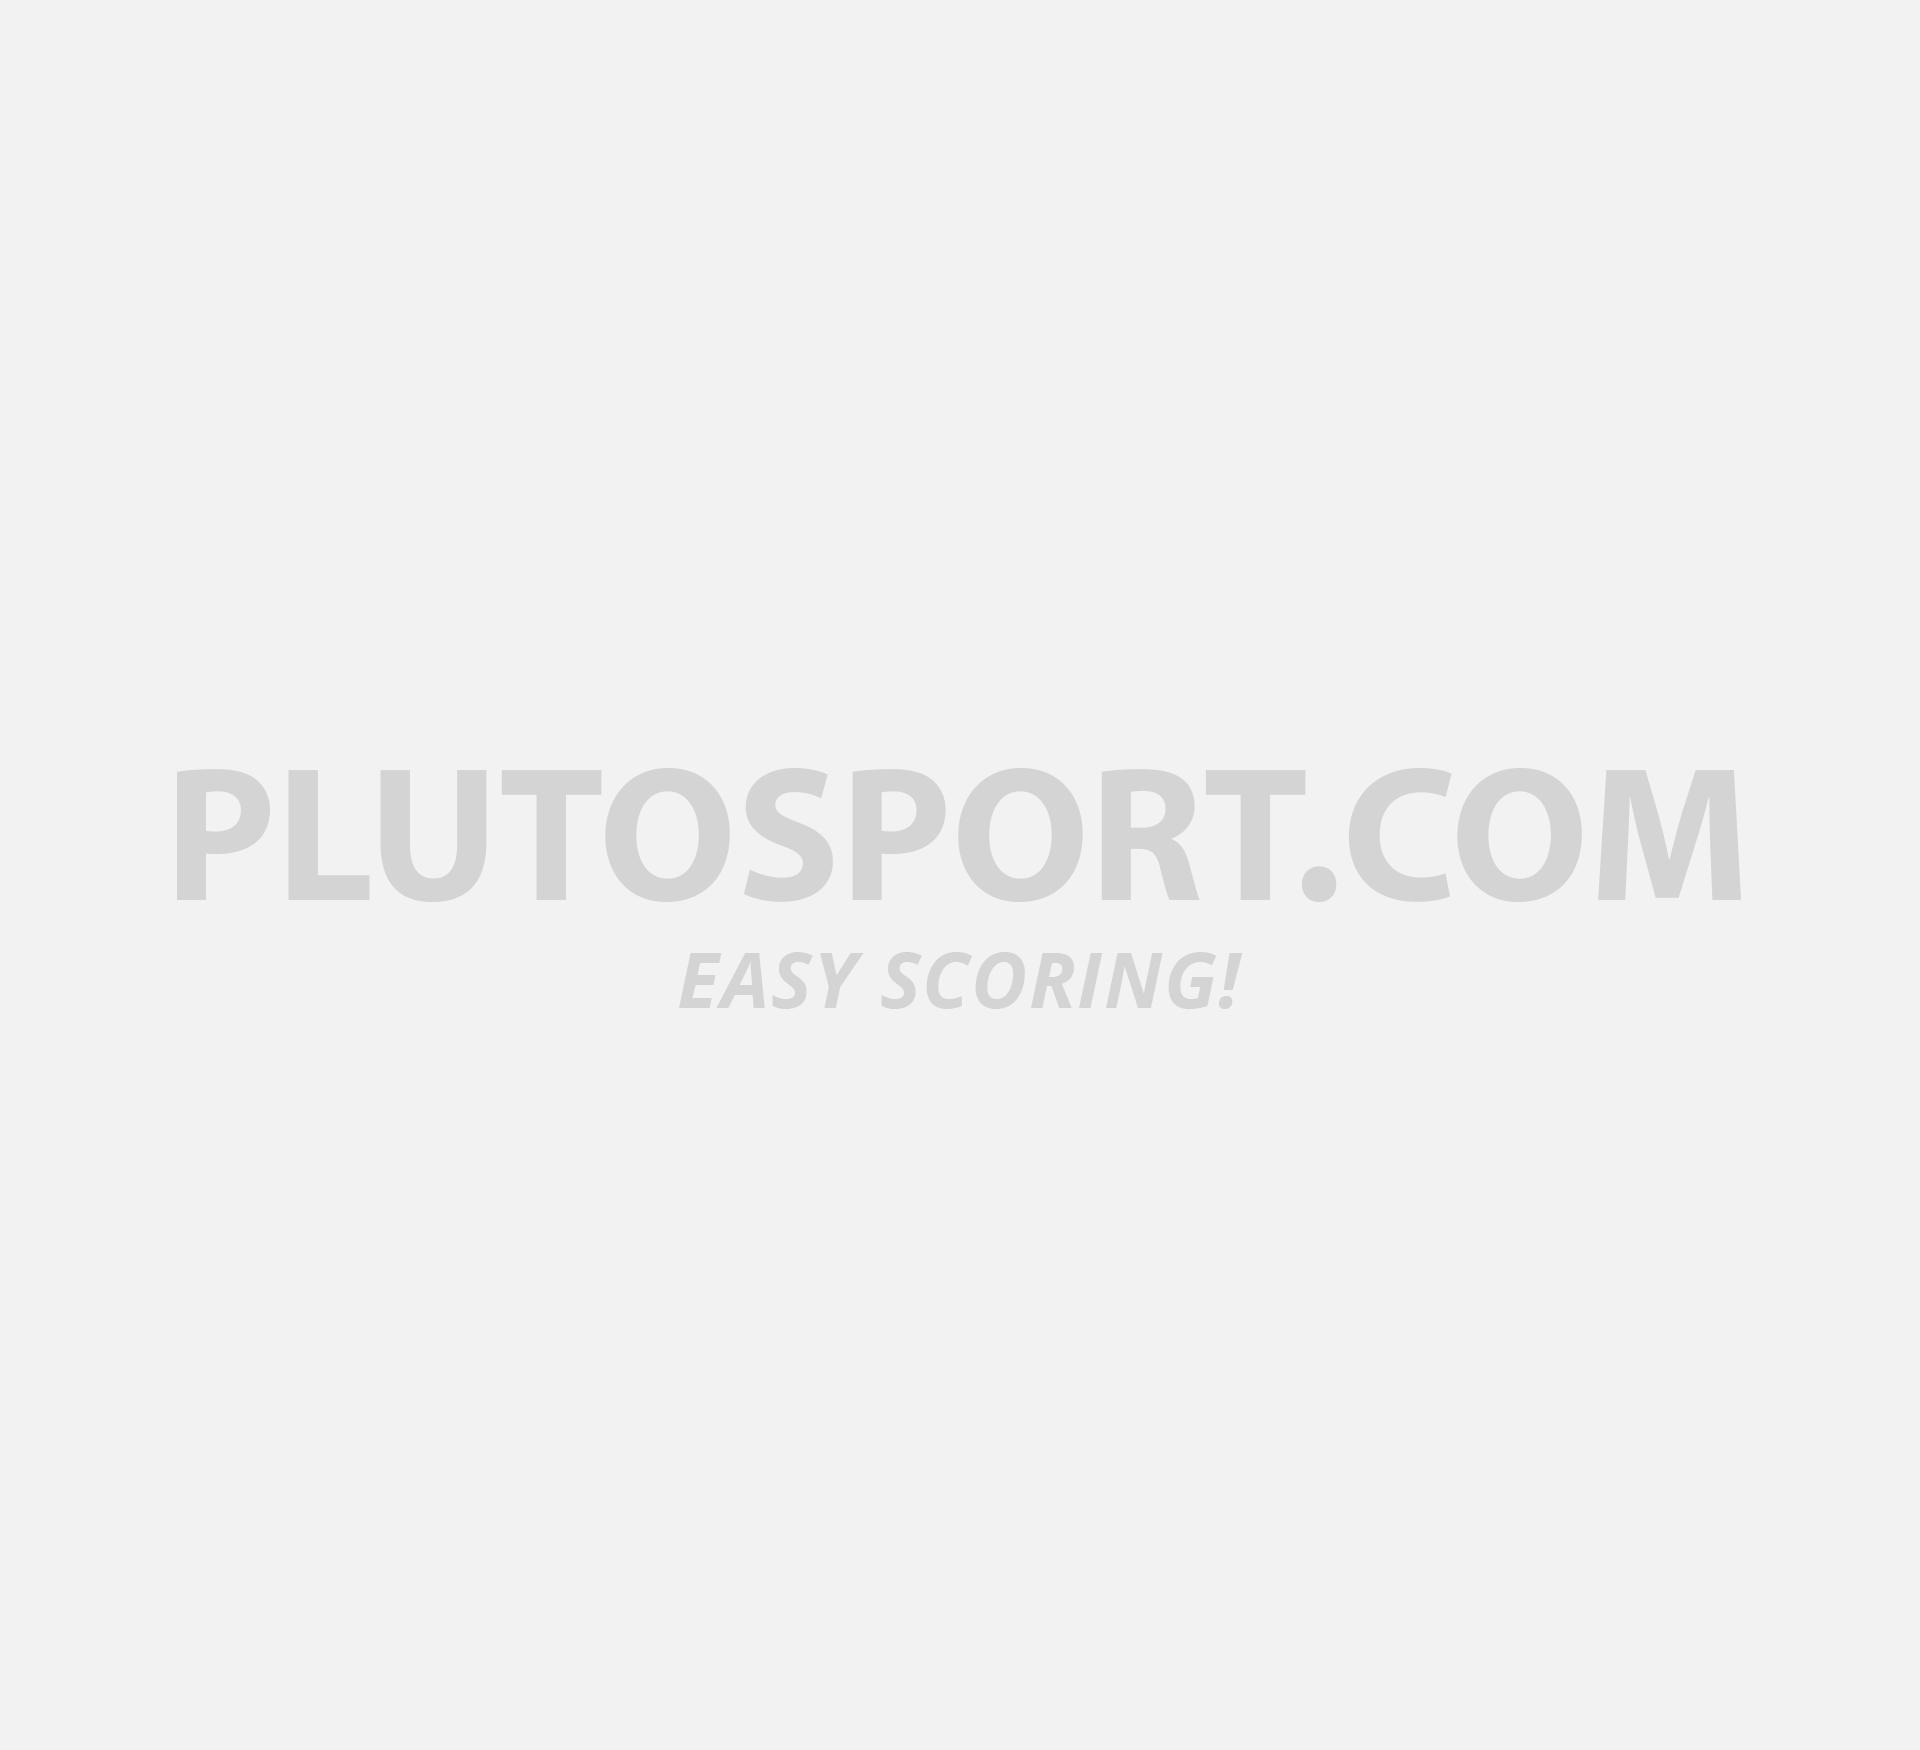 d5691cc77104 Saucony ProGrid Kinvara 3 Runningshoes Men - Neutral - Shoes ...